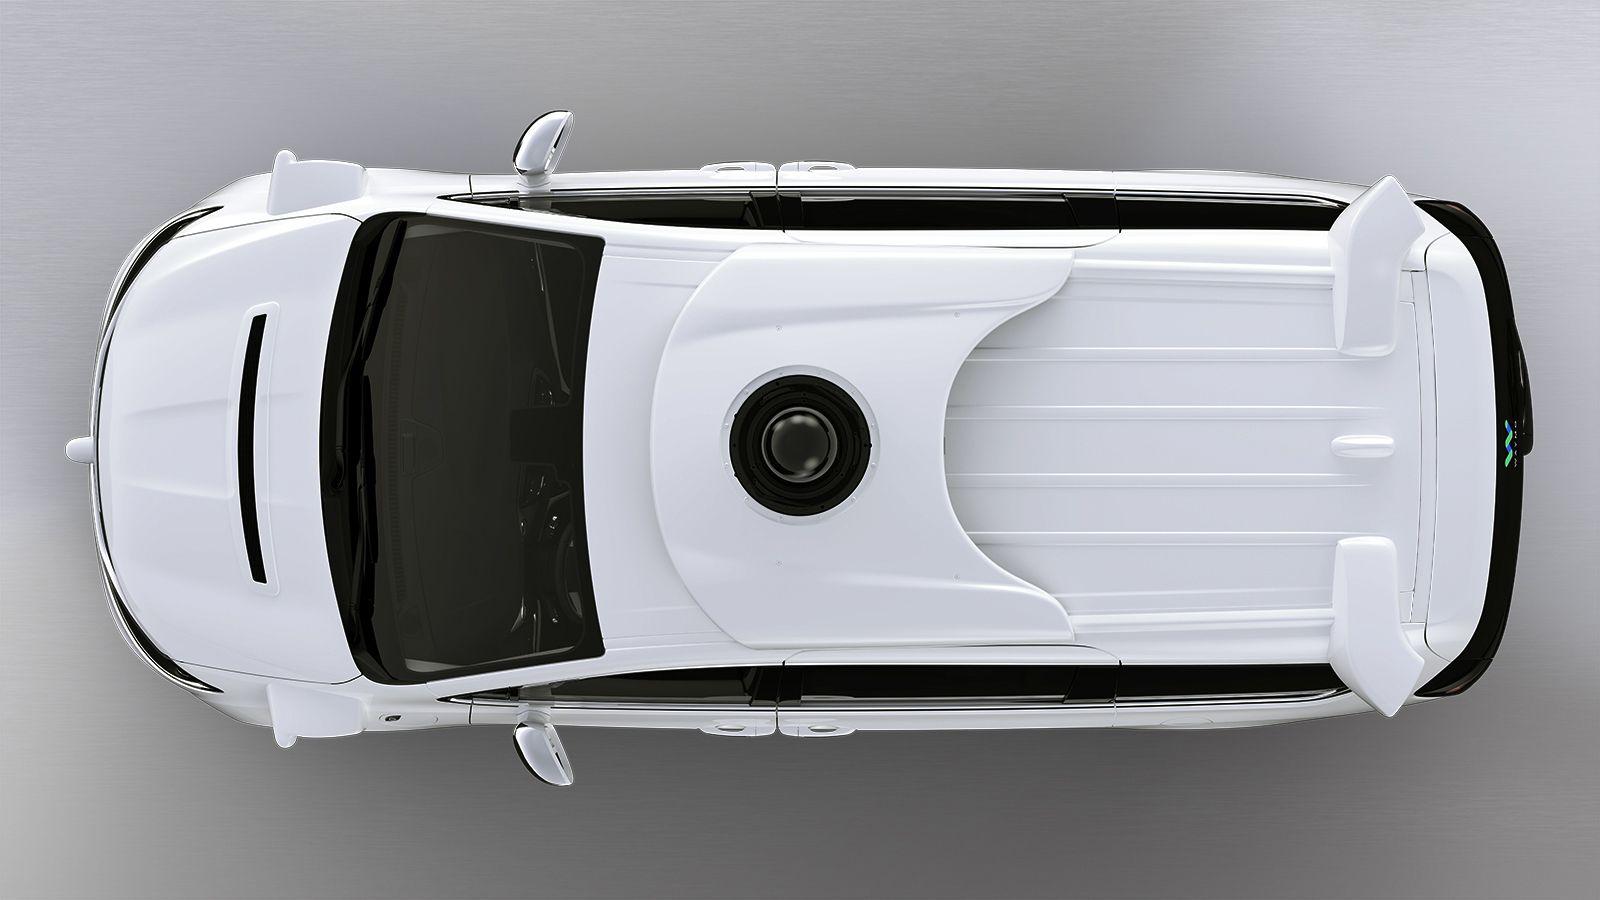 driverless car waymo google self-driving